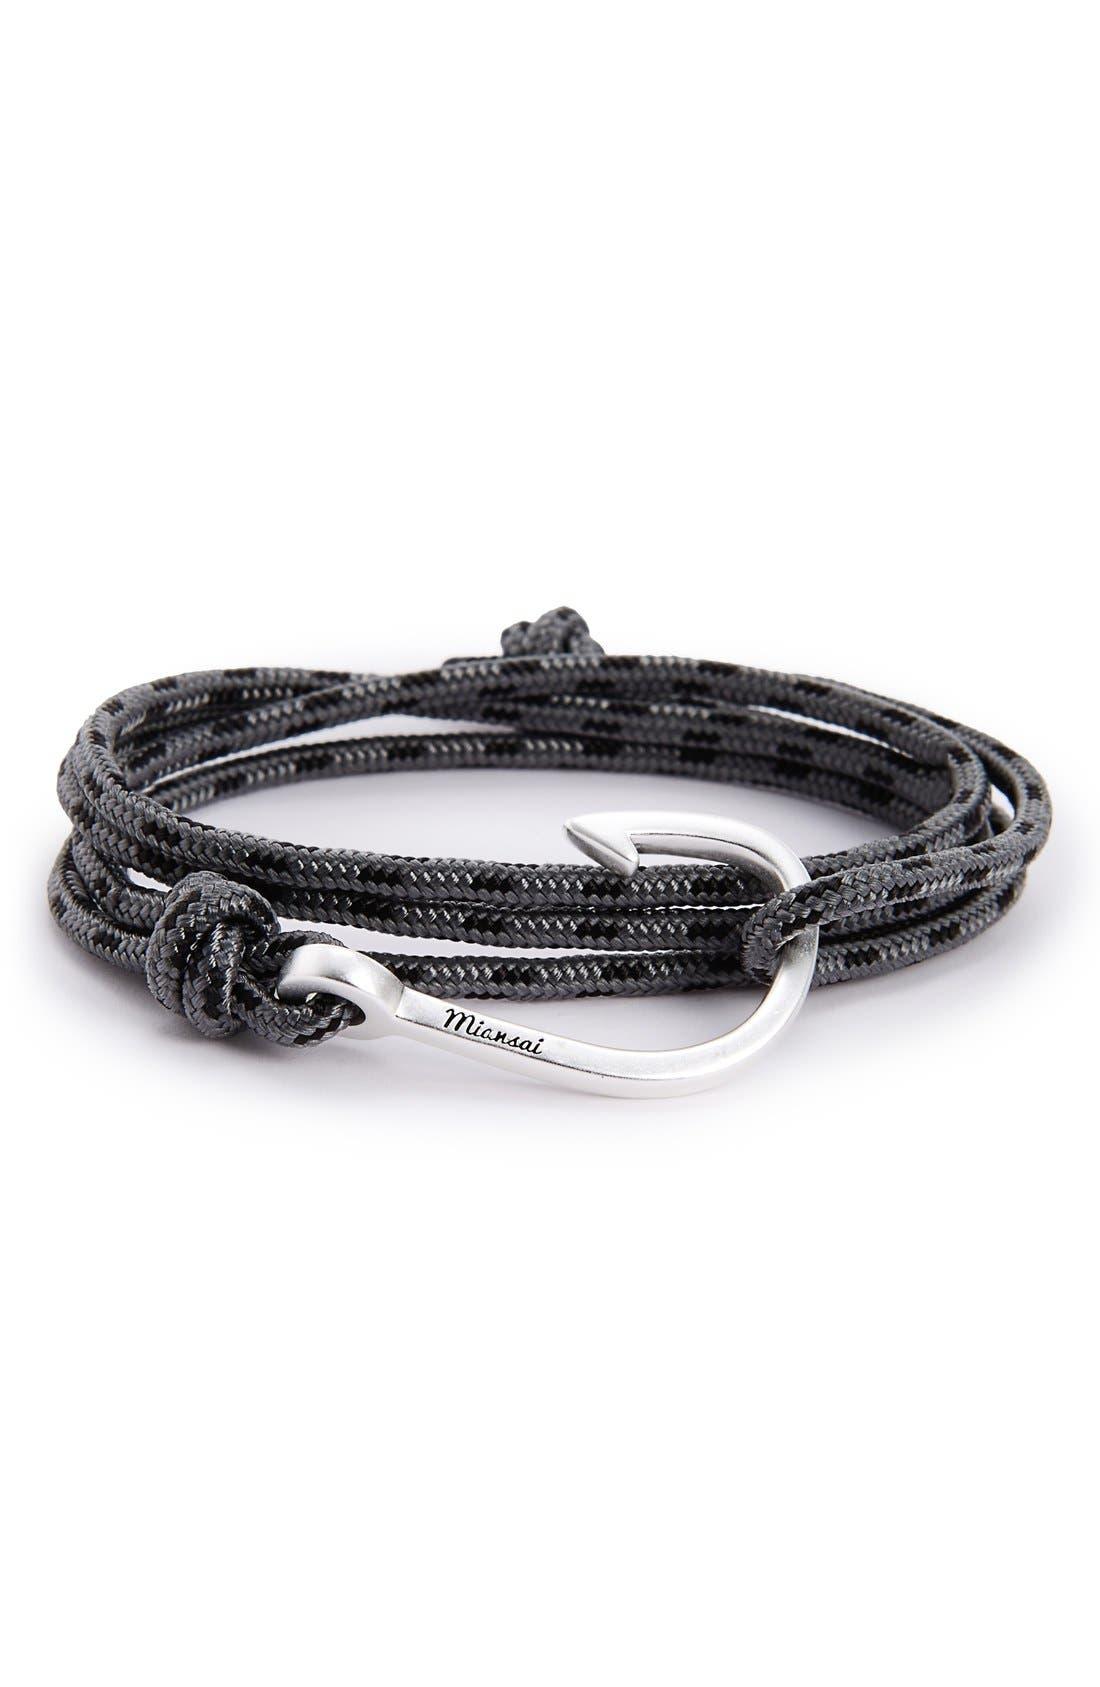 Hook & Rope Wrap Bracelet,                             Main thumbnail 1, color,                             055